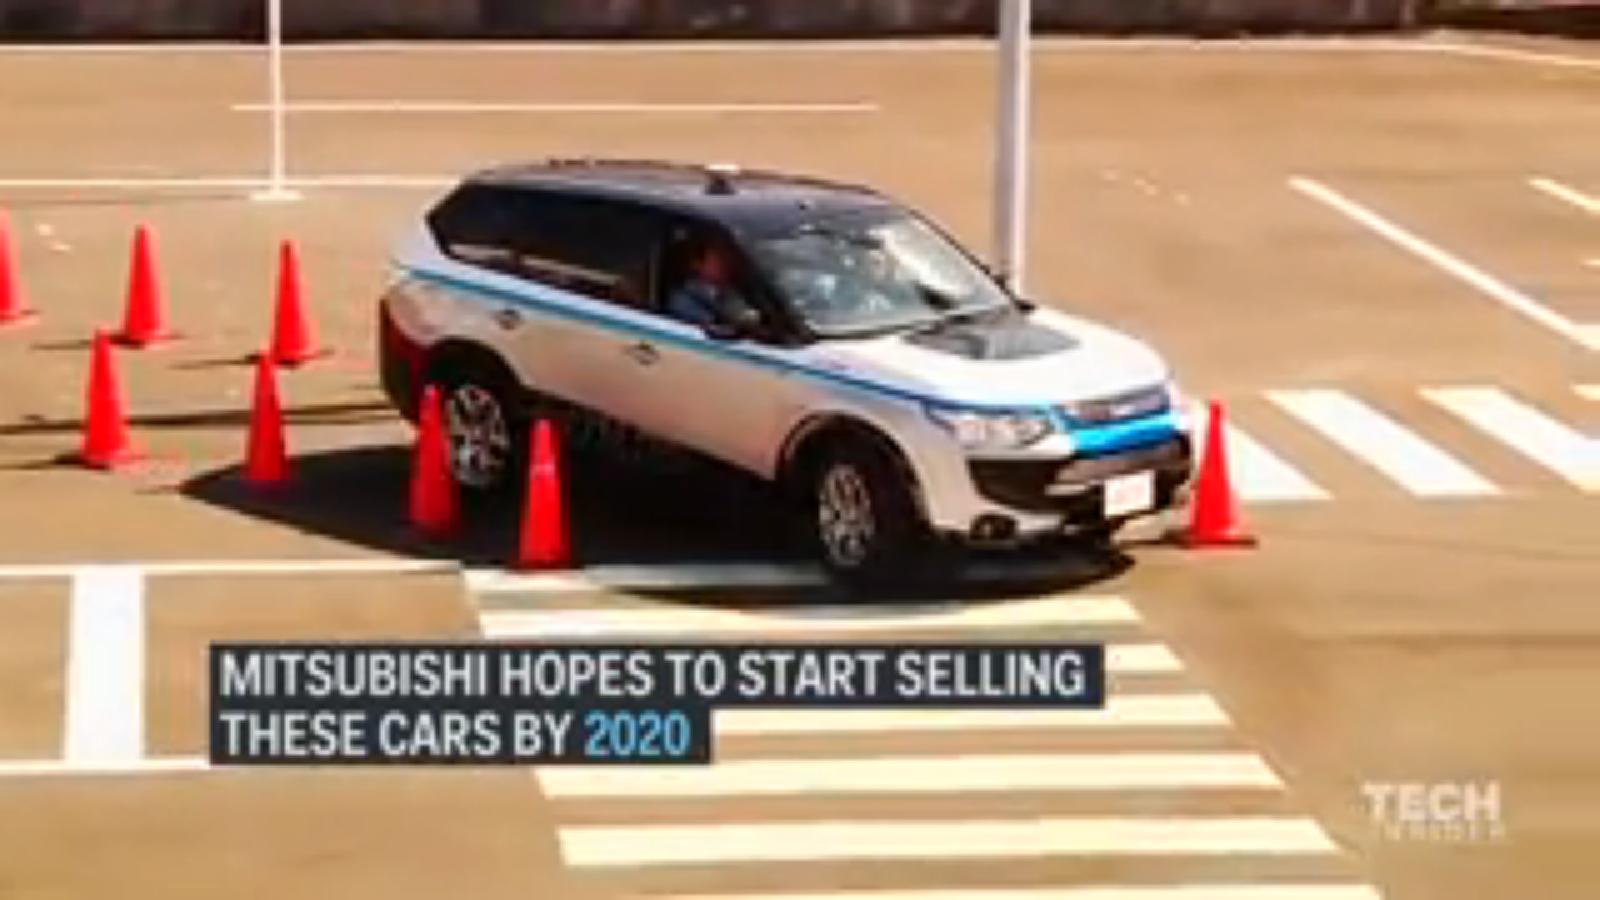 technology mitsubishi s self driving car should go on sale in 2020 video jayforce. Black Bedroom Furniture Sets. Home Design Ideas